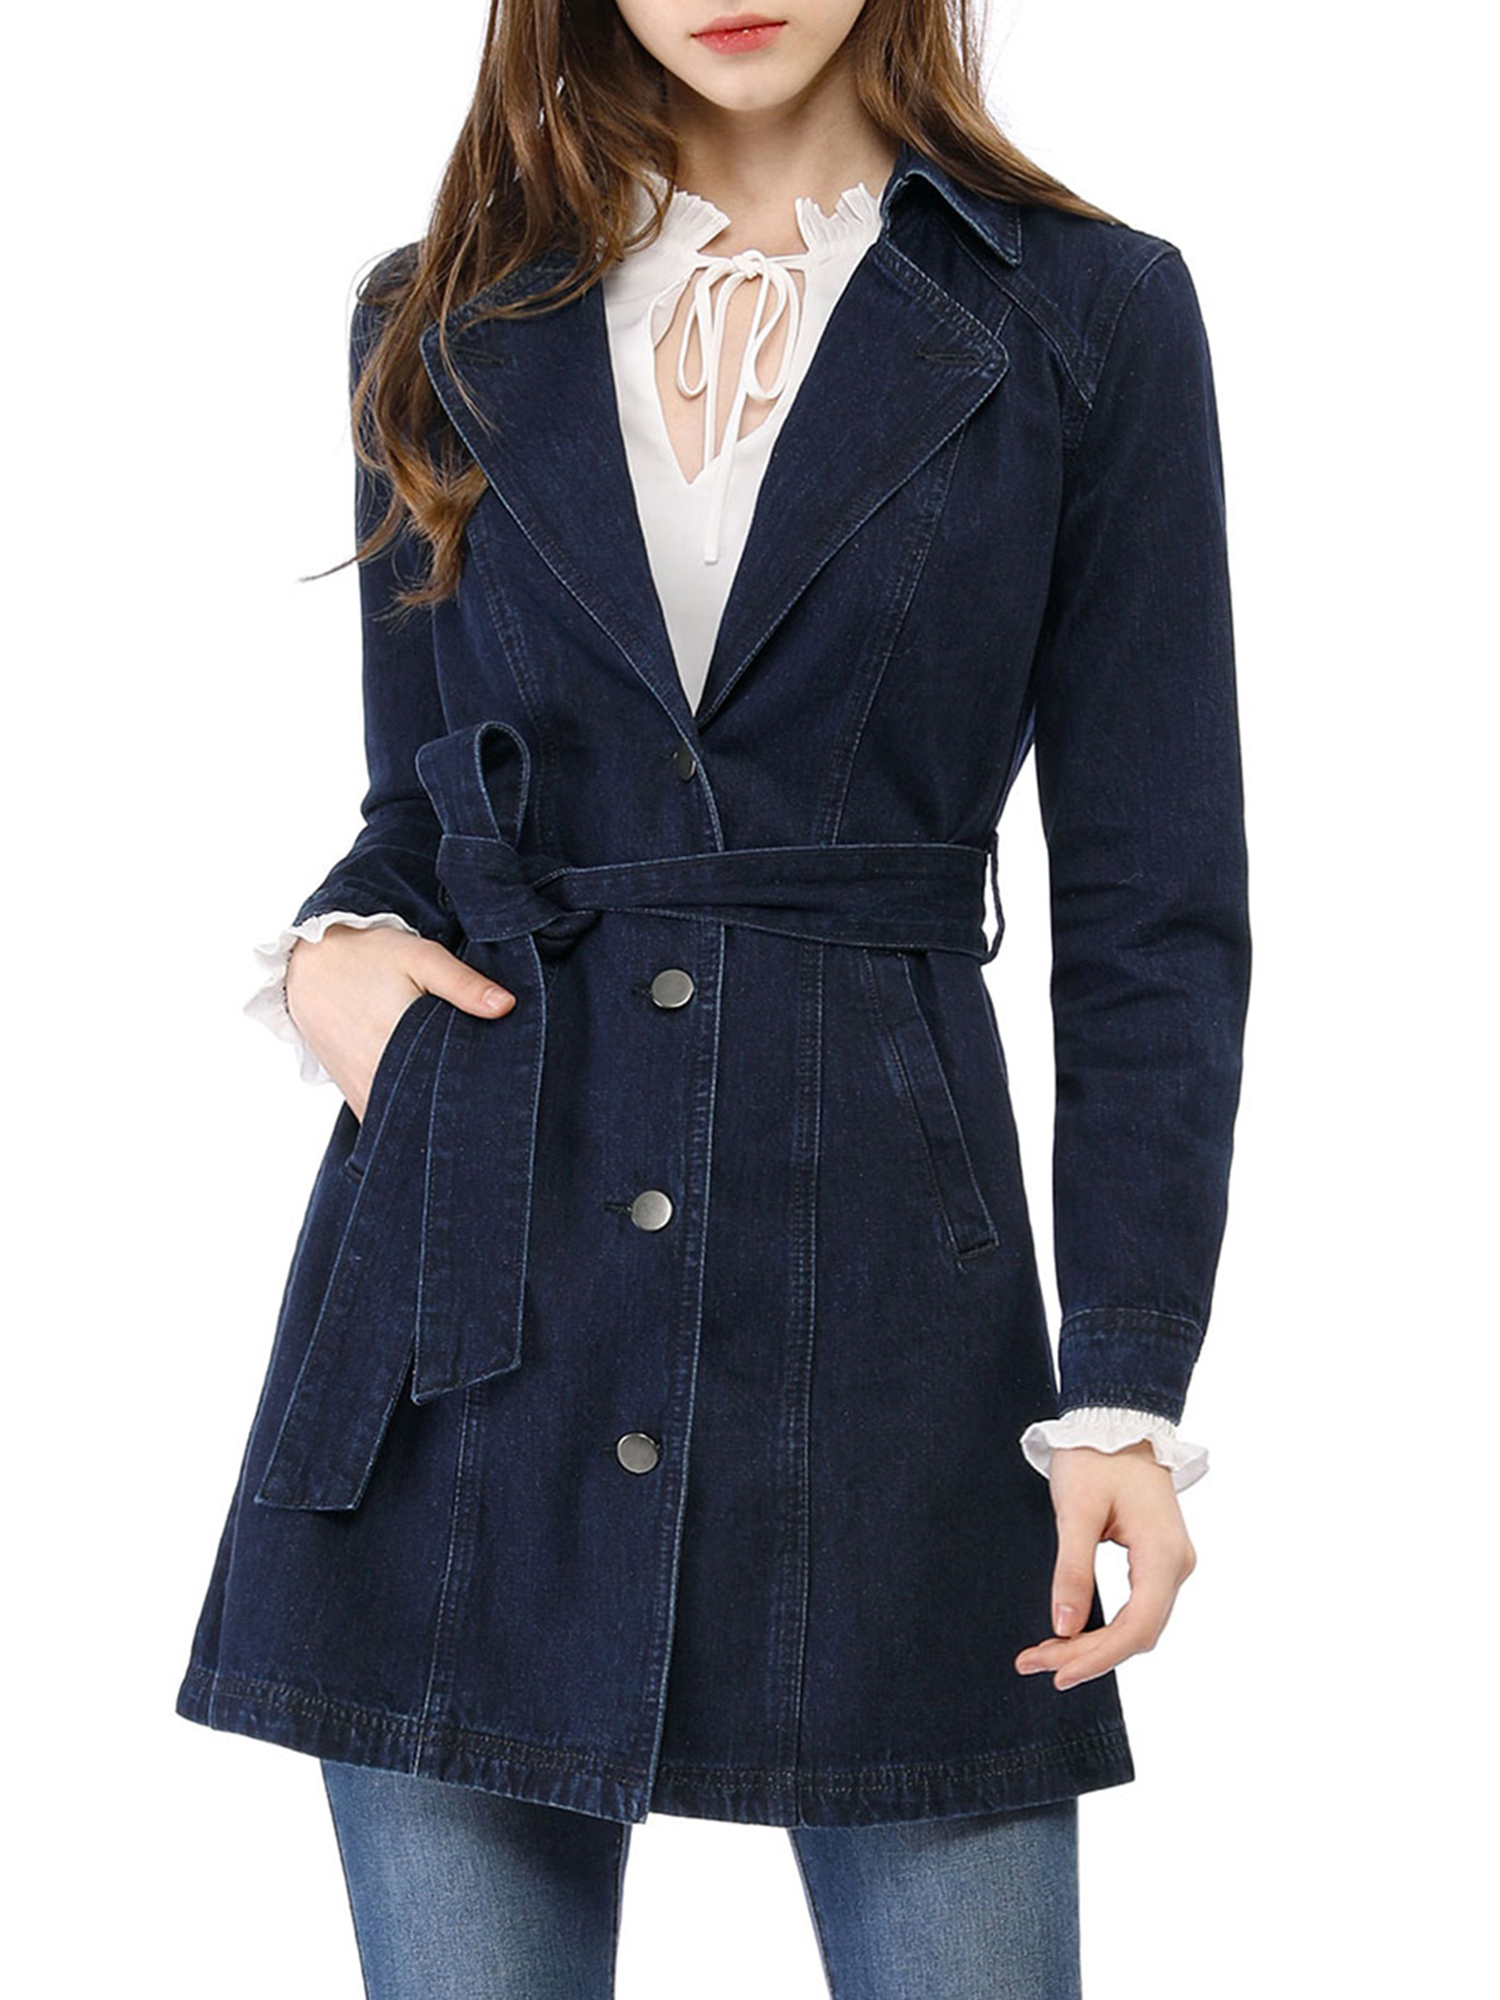 Allegra K Womens Notched Lapel Belted Trench Long Jean Denim Jacket